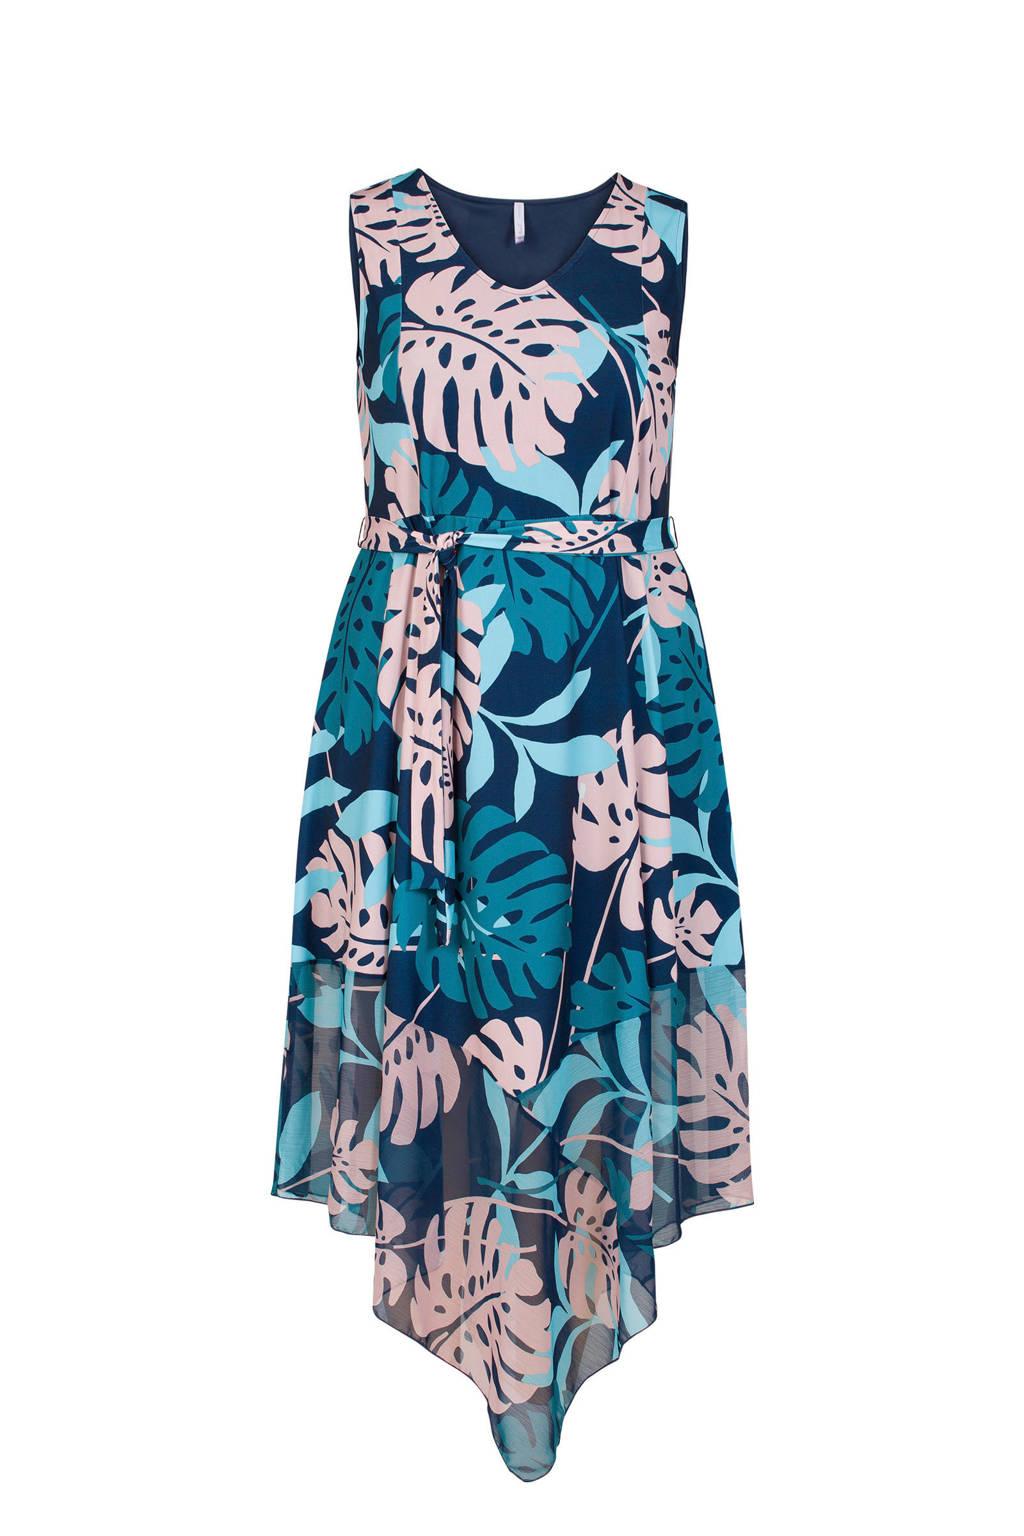 Miss Etam Plus jurk met bladprint petrol, Petrol